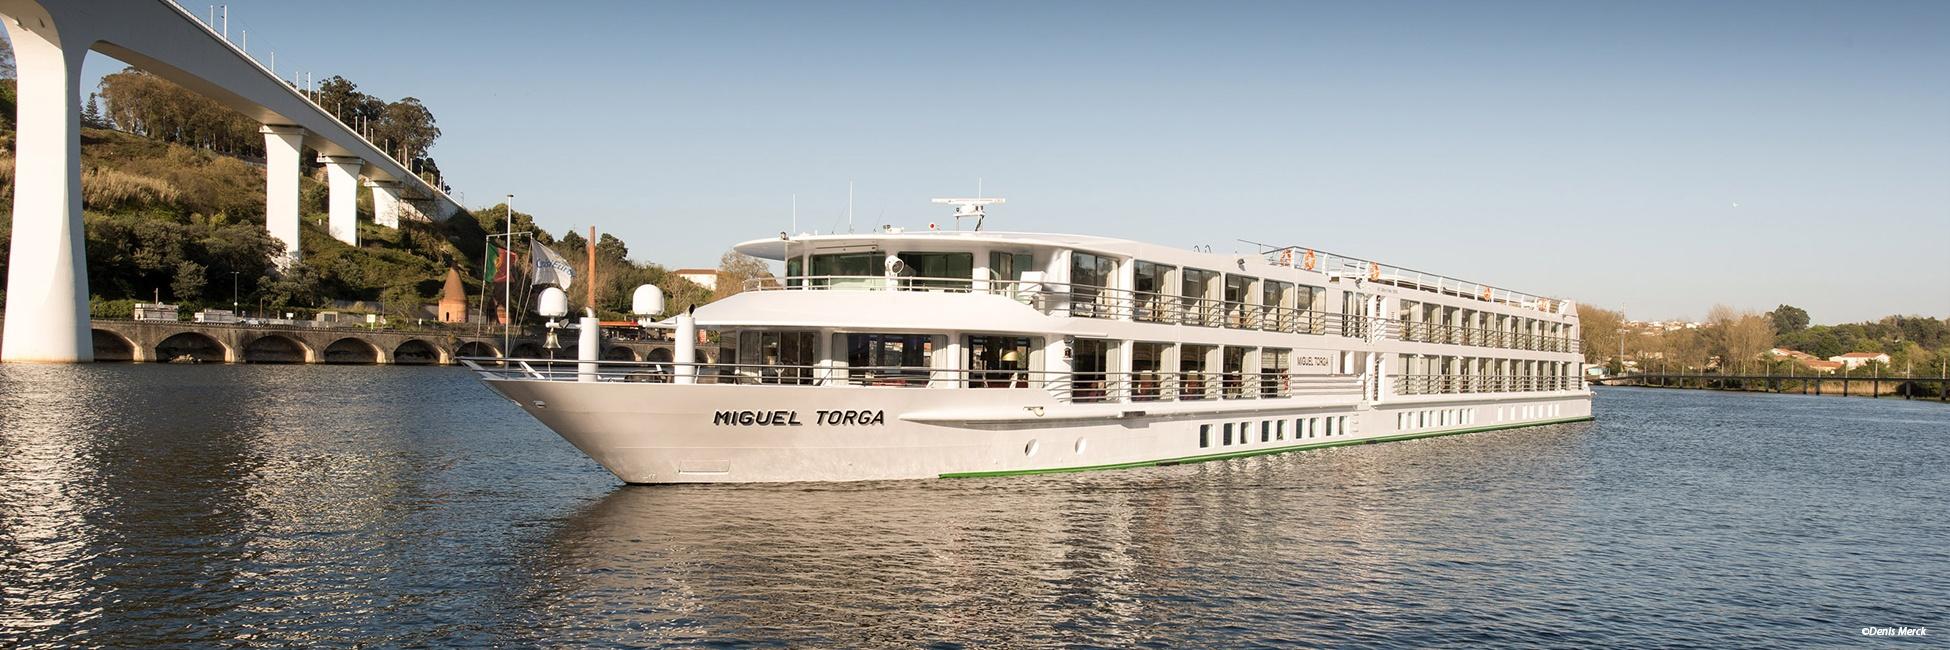 MS Miguel Torga en navigation